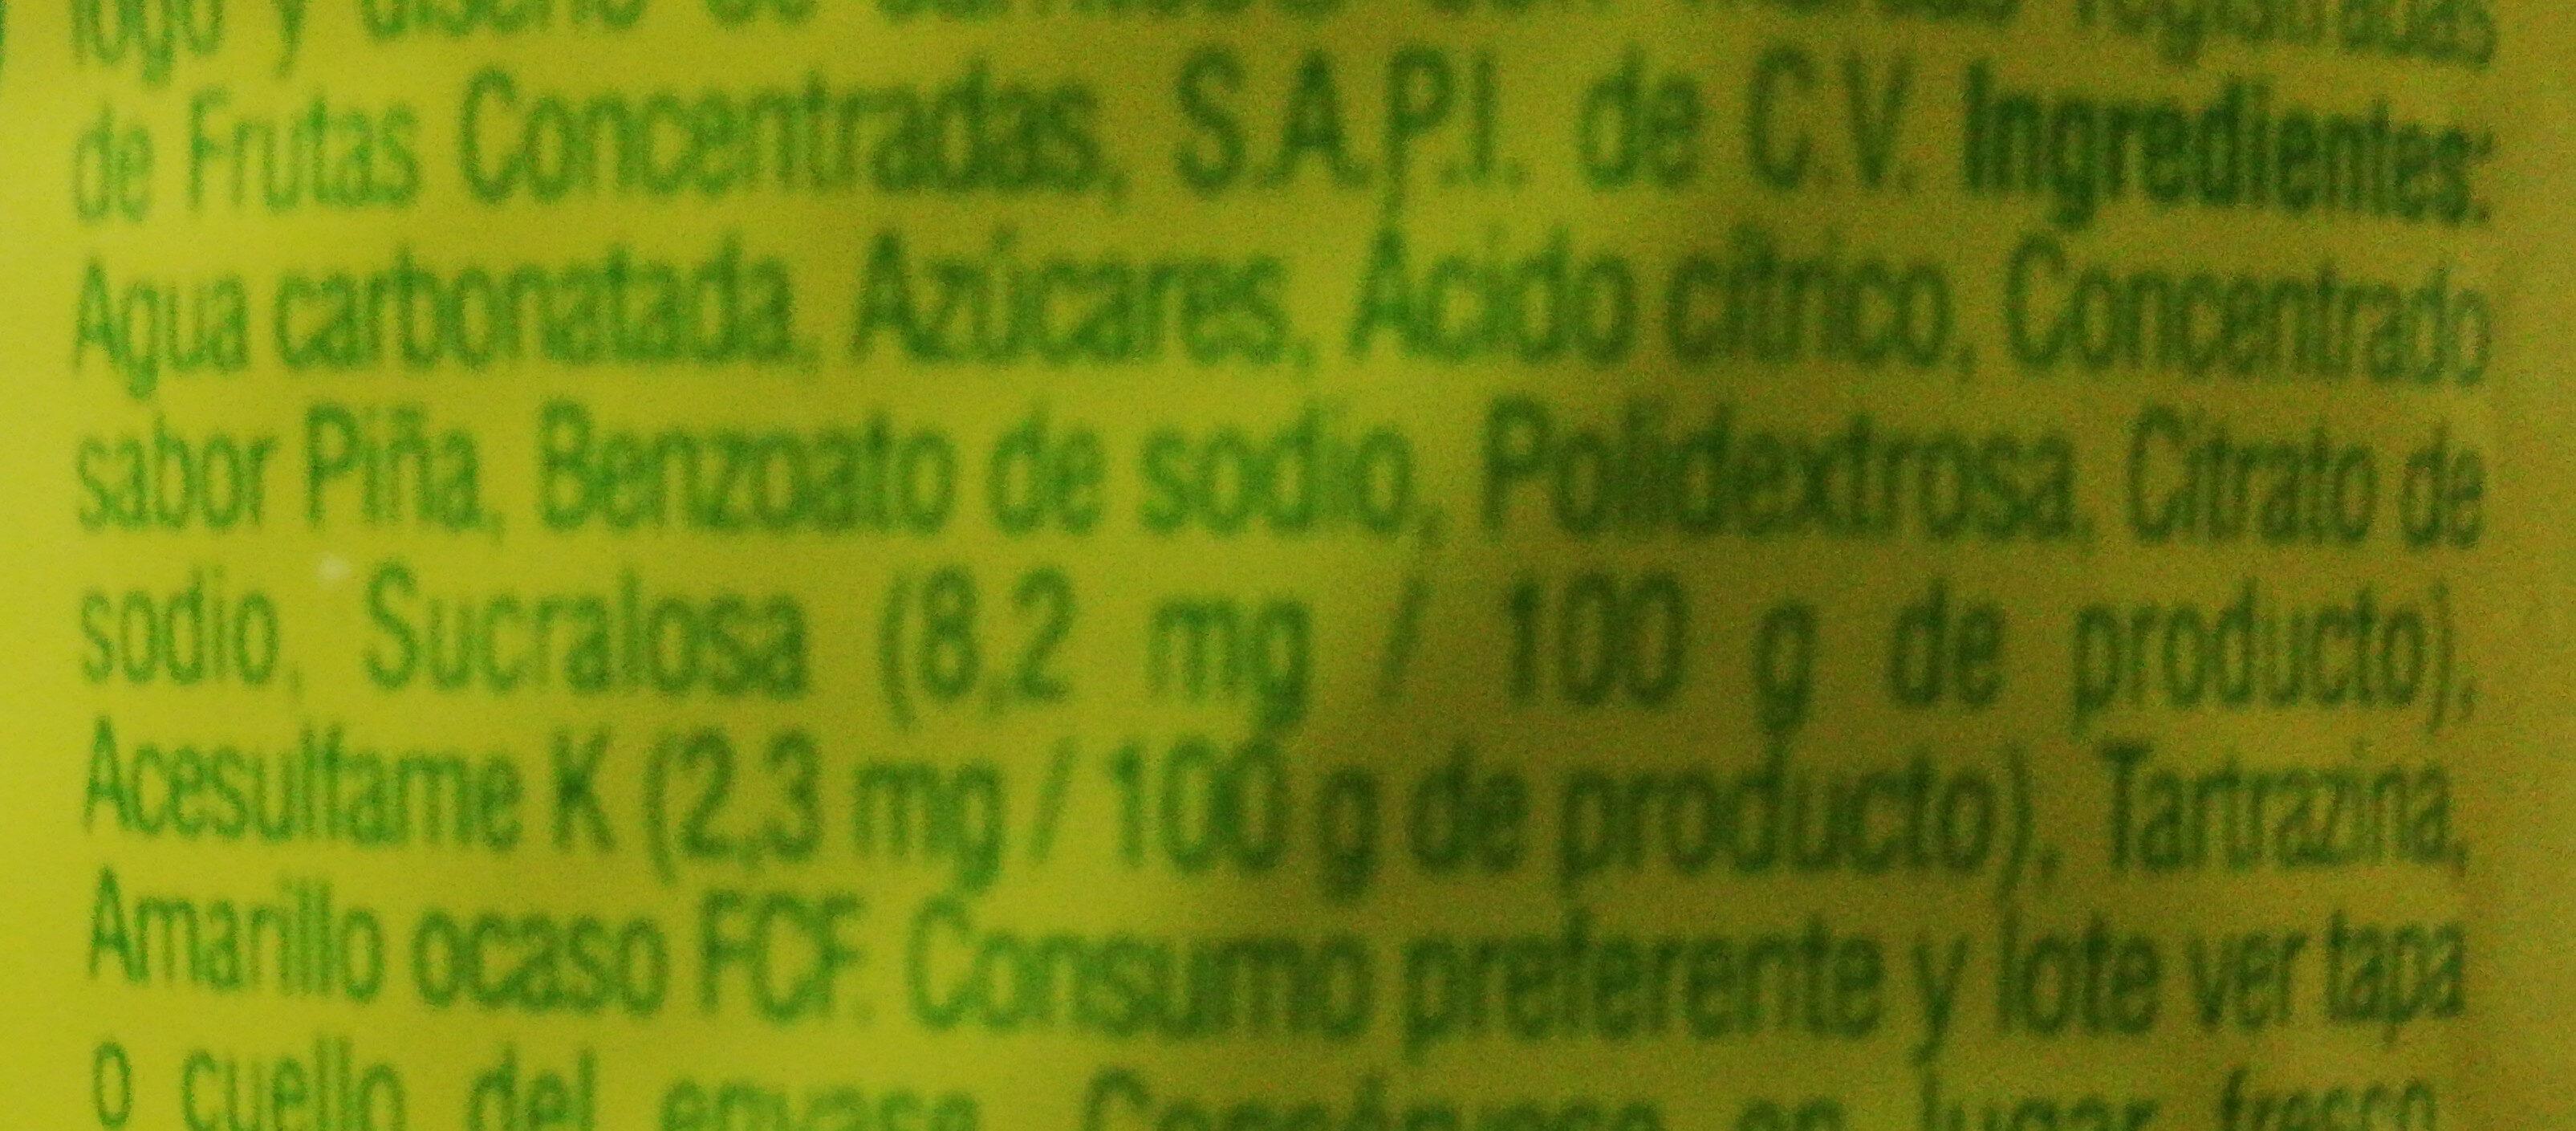 Jarritos sabor piña - Ingrédients